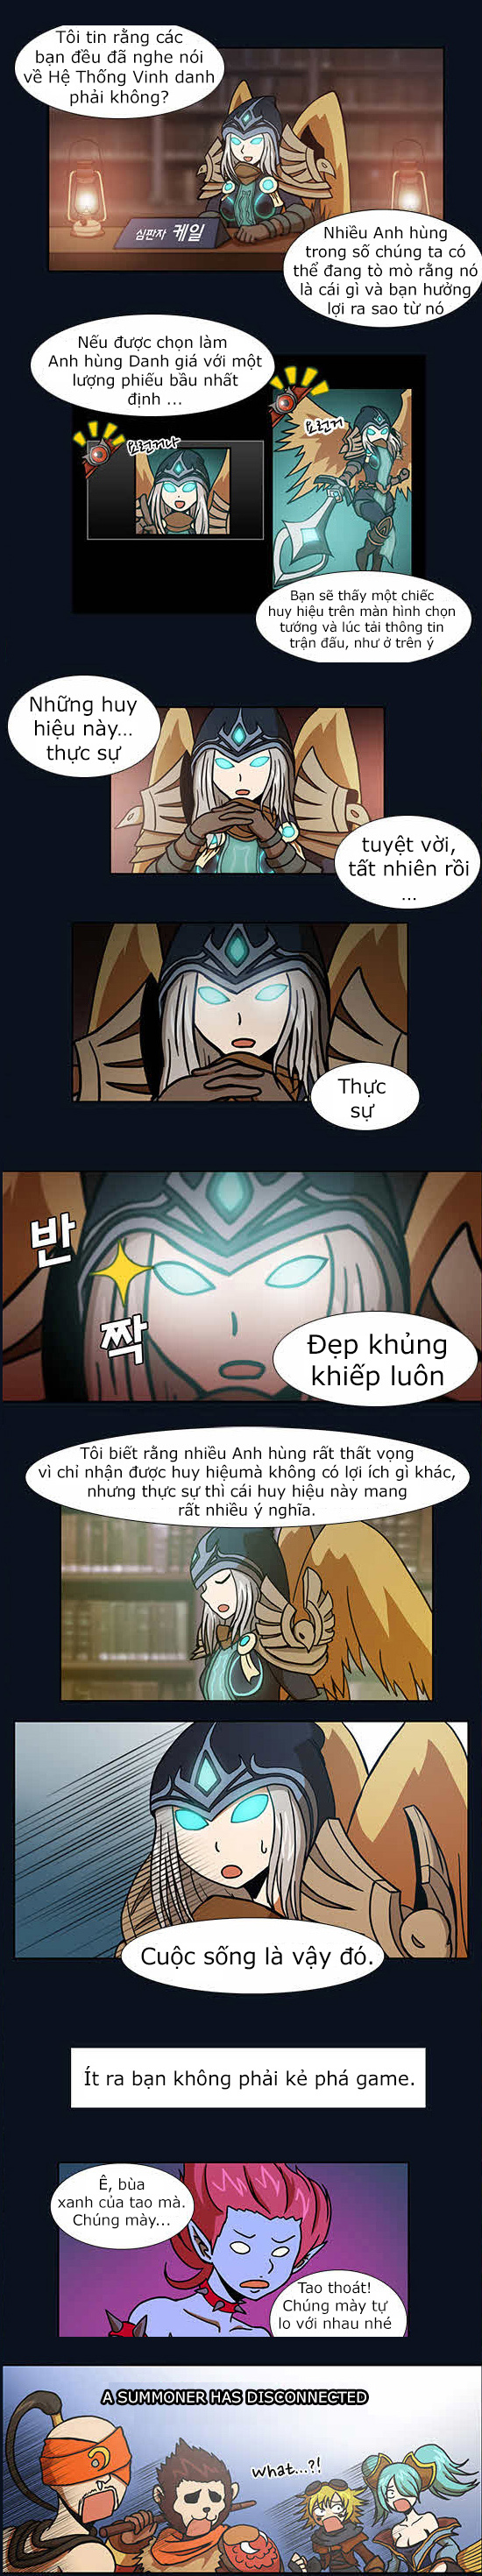 131001_gamelandvn_lienminhhuyenthoai01